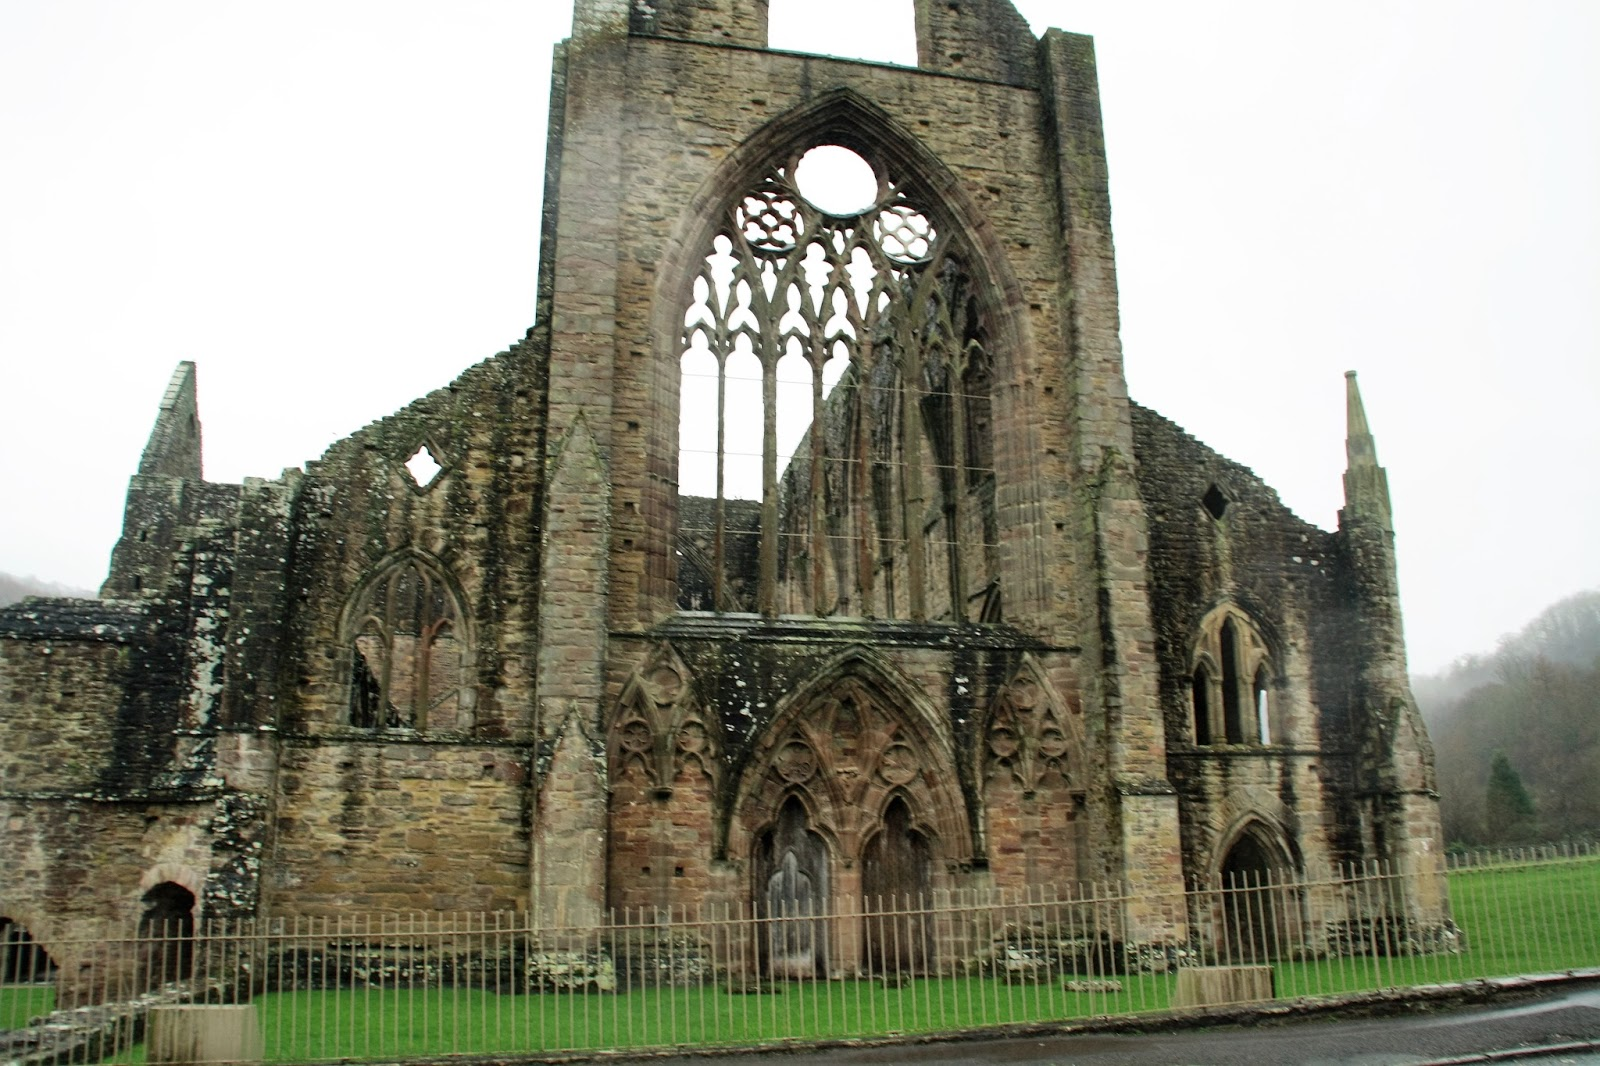 romantic characteristics in tintern abbey